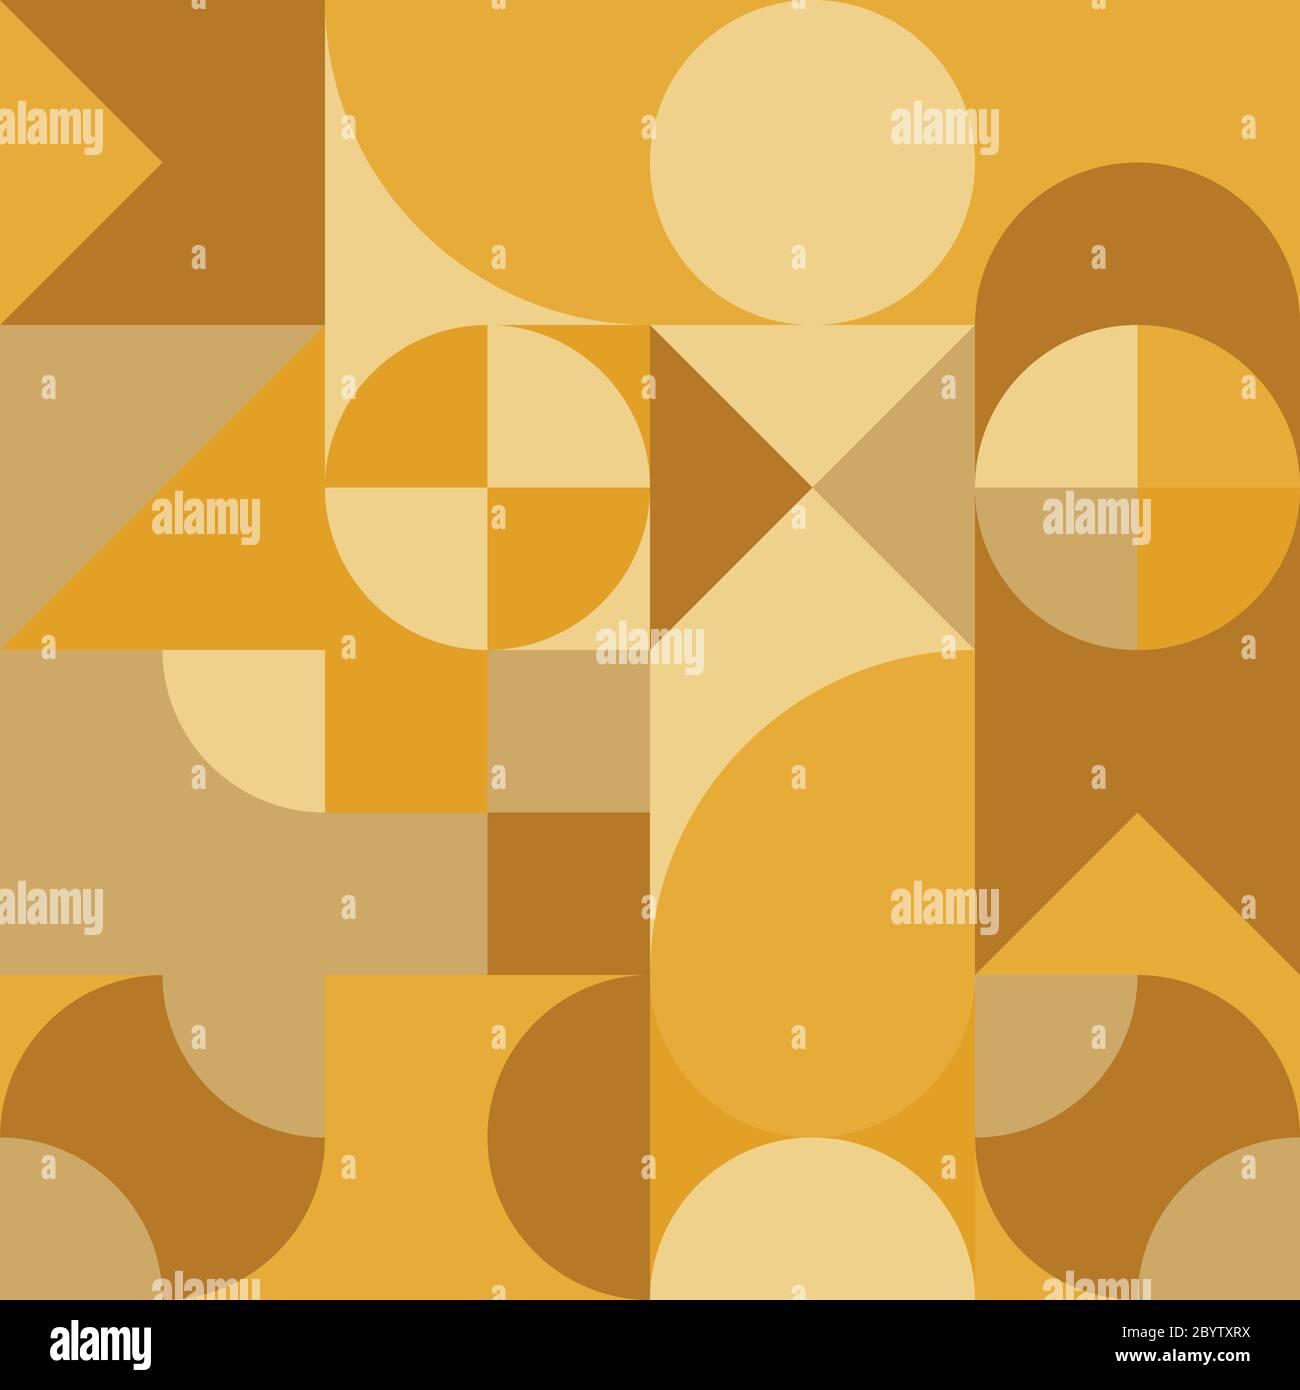 Abstraktes geometrisches Retro-Design. Vektor-Nahtloses Muster in gelben Farbtönen. Stock Vektor